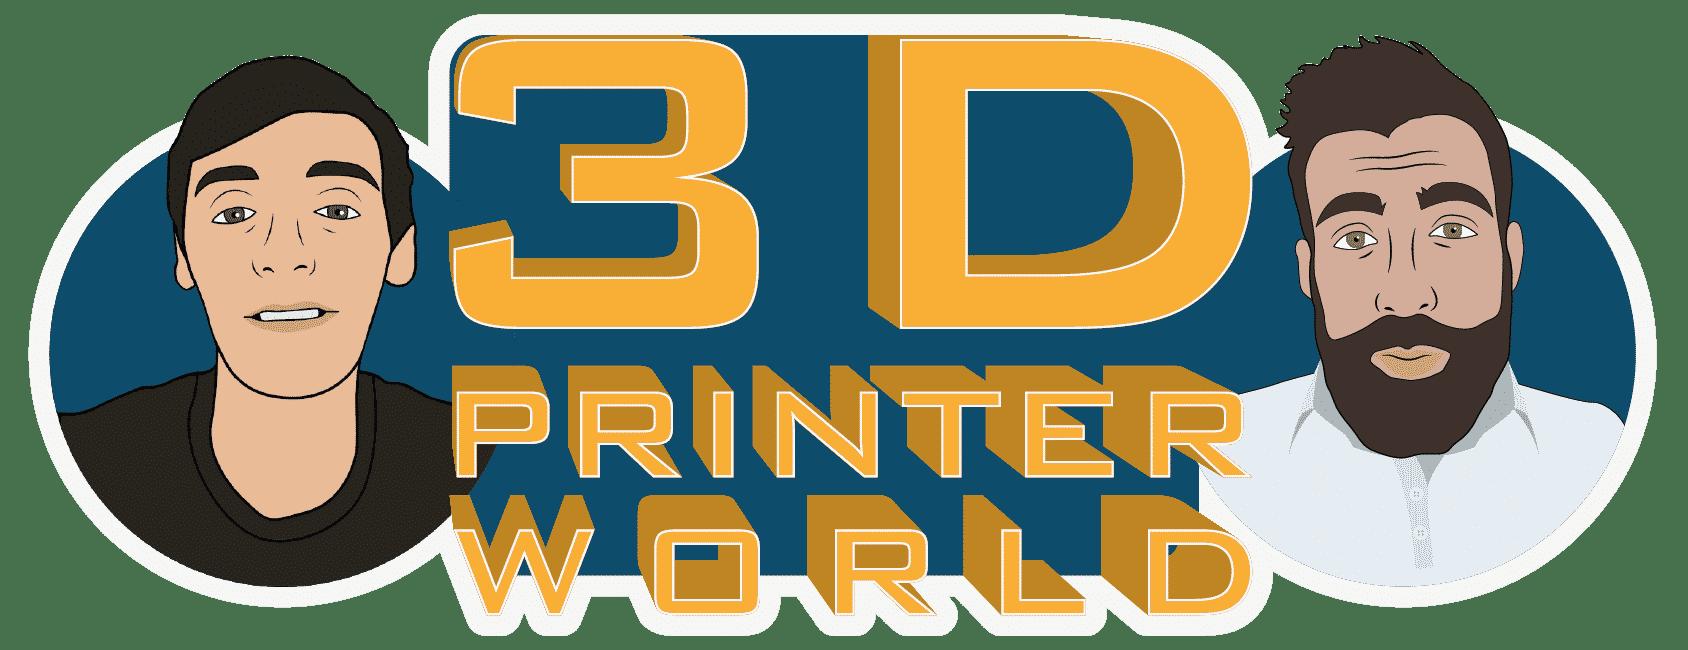 3dprinterworldexpo